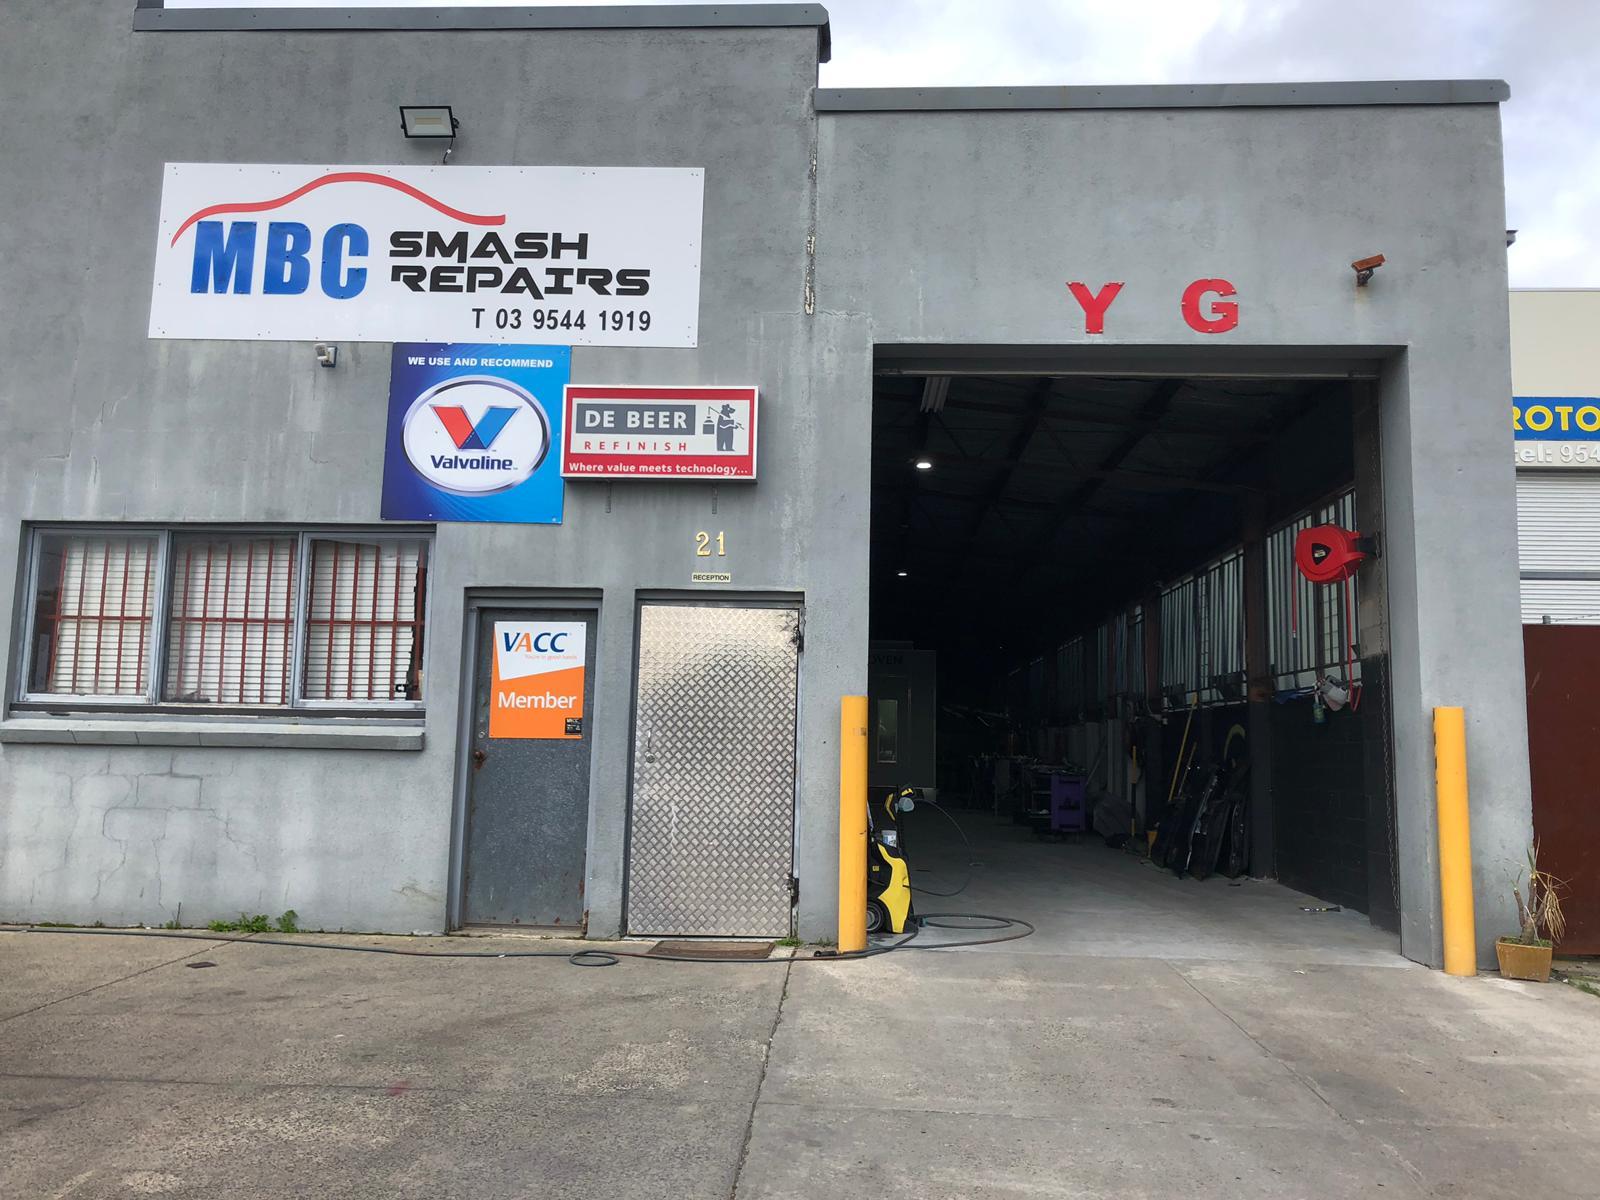 YG & MBC Smash Repair Photos